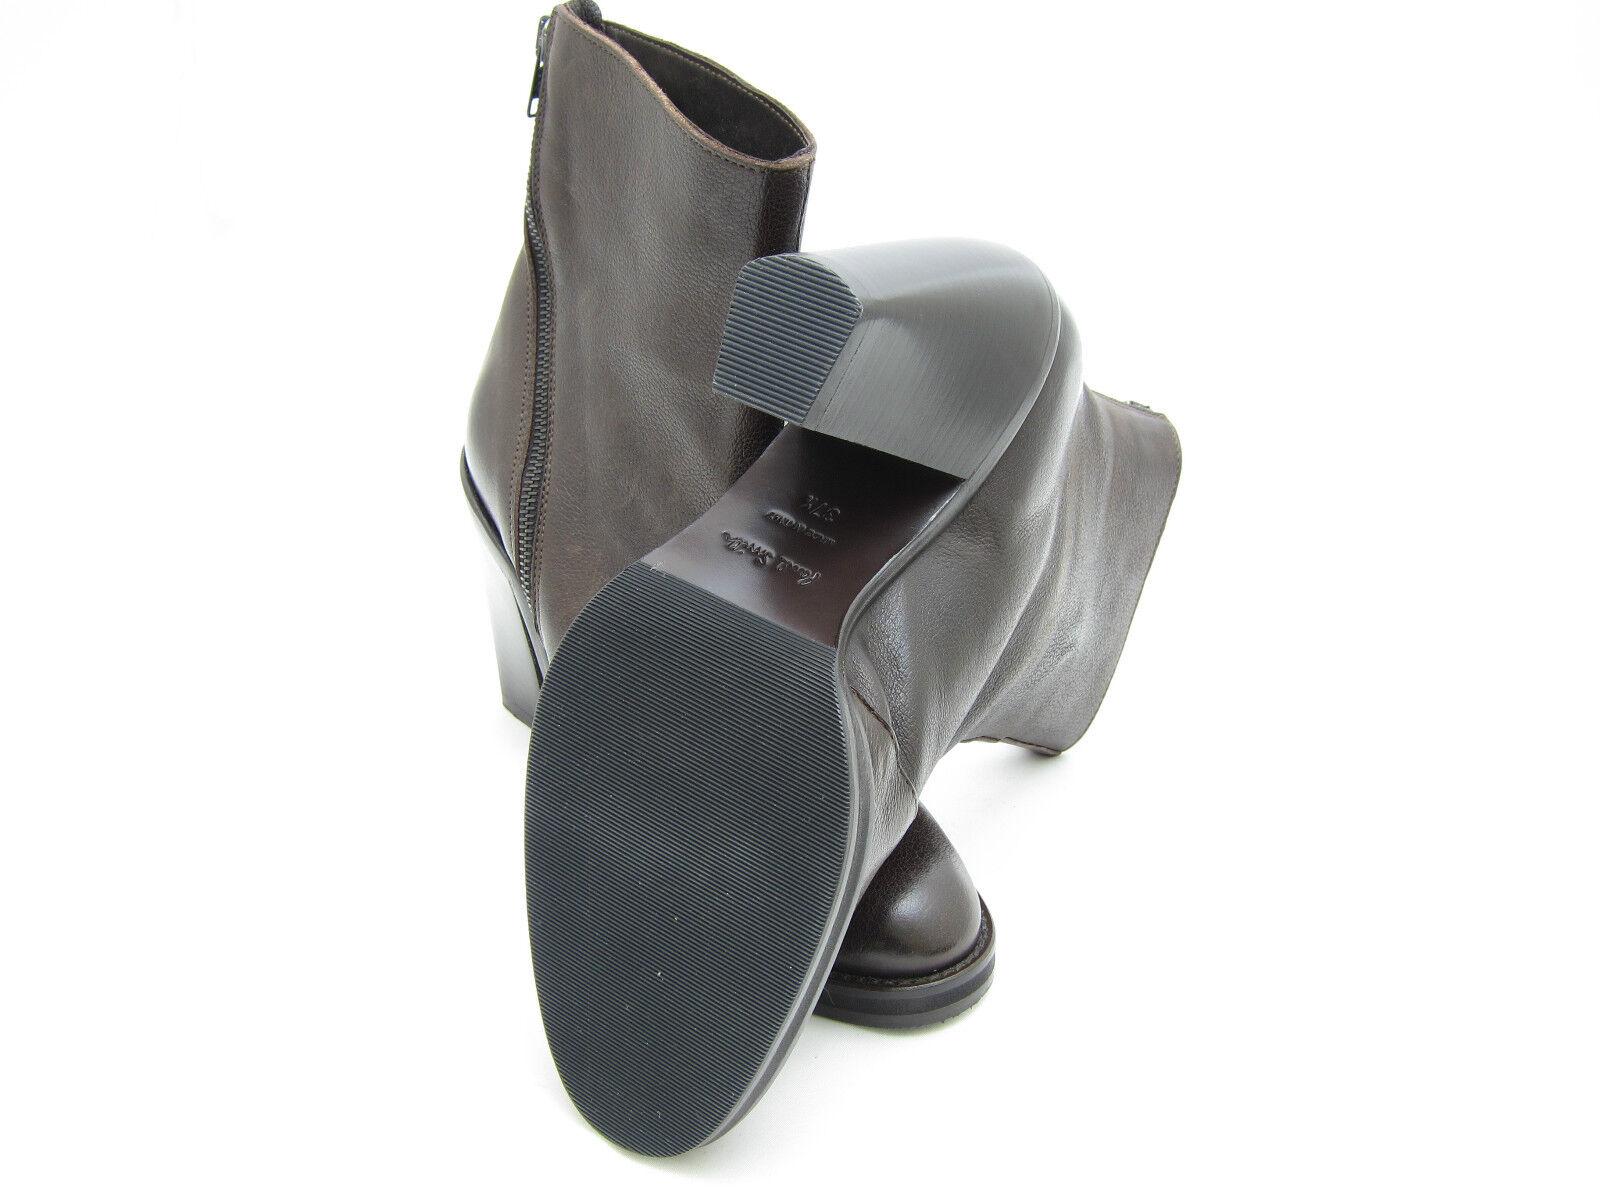 Paul Bota Smith zapatos impulsó Bota Paul Marrón Chocolate Talla 37.5 nuevos y en caja con bolsa antipolvo 76e63c